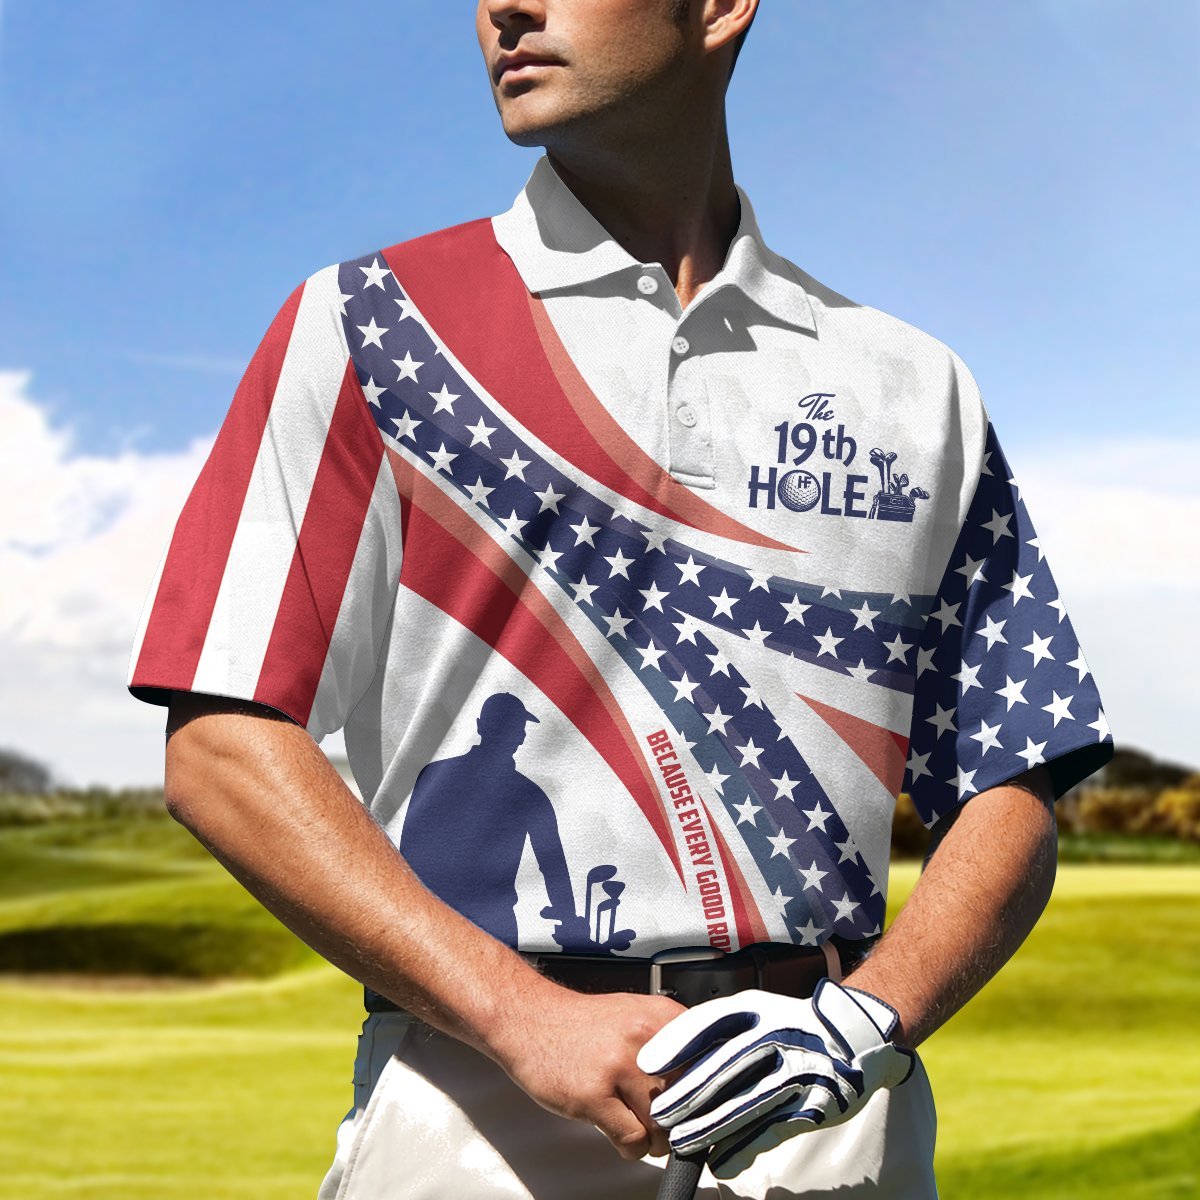 Personalized The Nineteenth Hole Golfer Polo Shirt 2